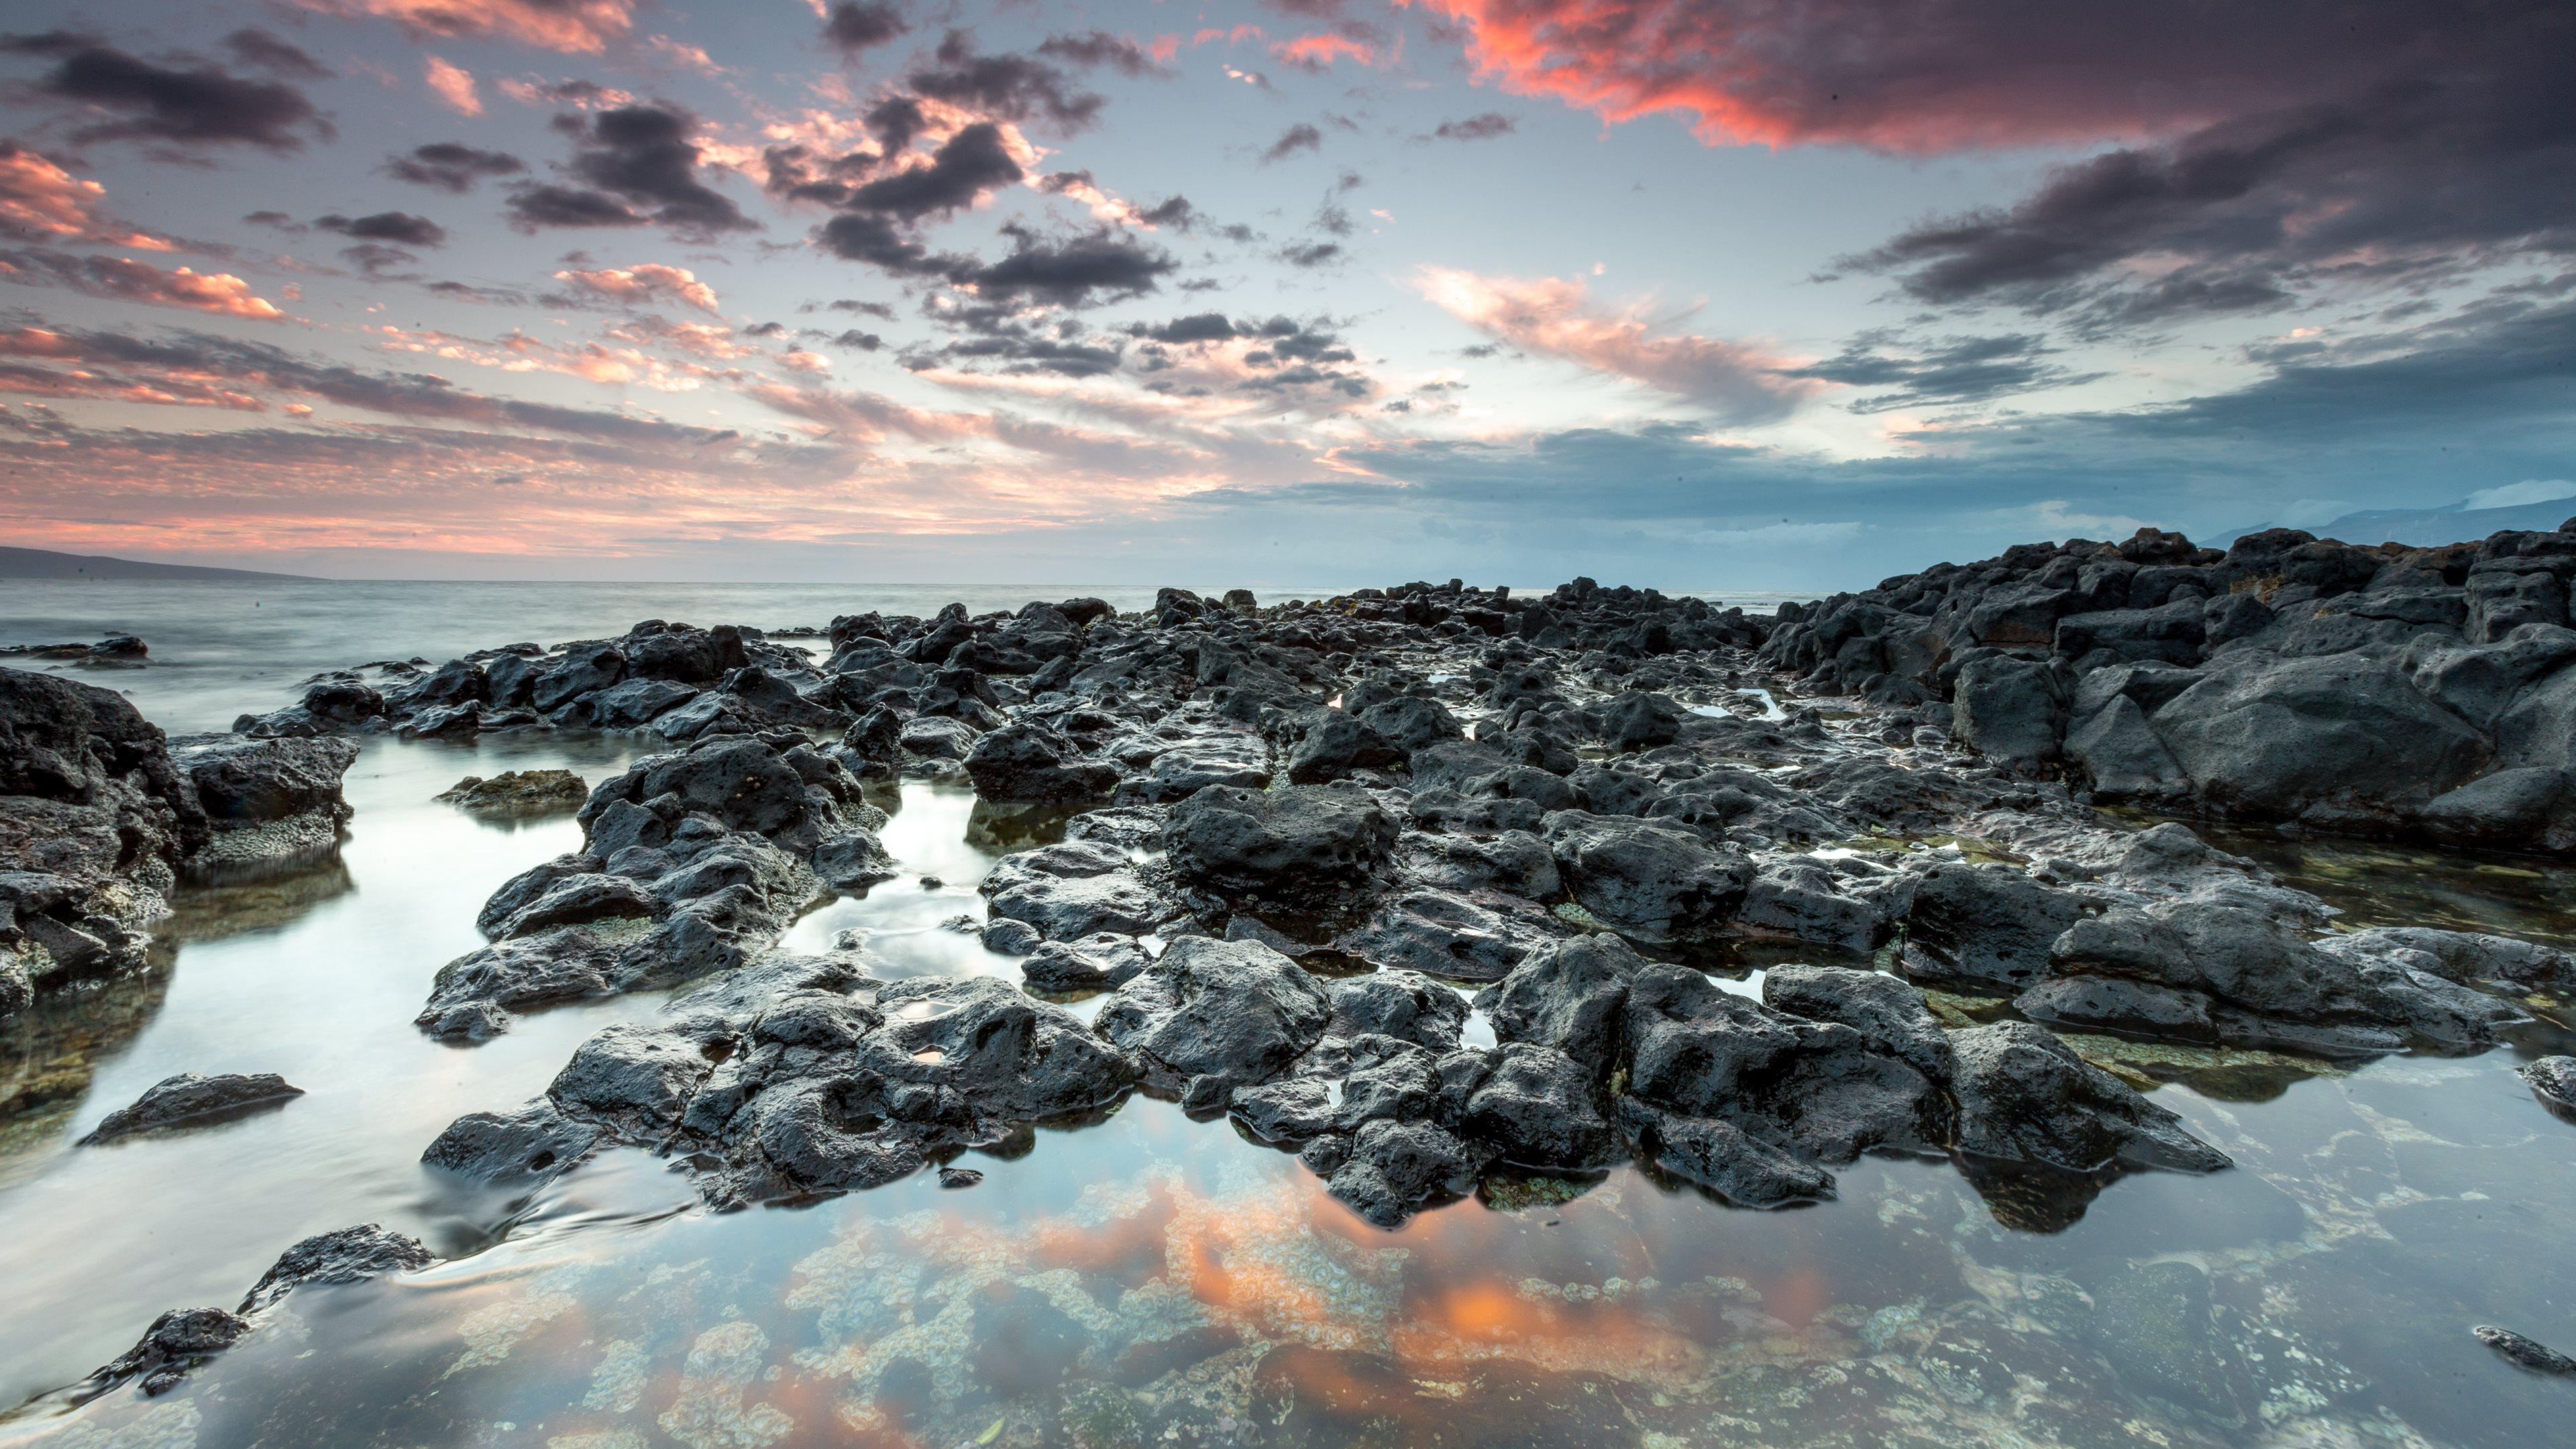 rocks shore skylineultrahdwallpapersjpg 3840x2160